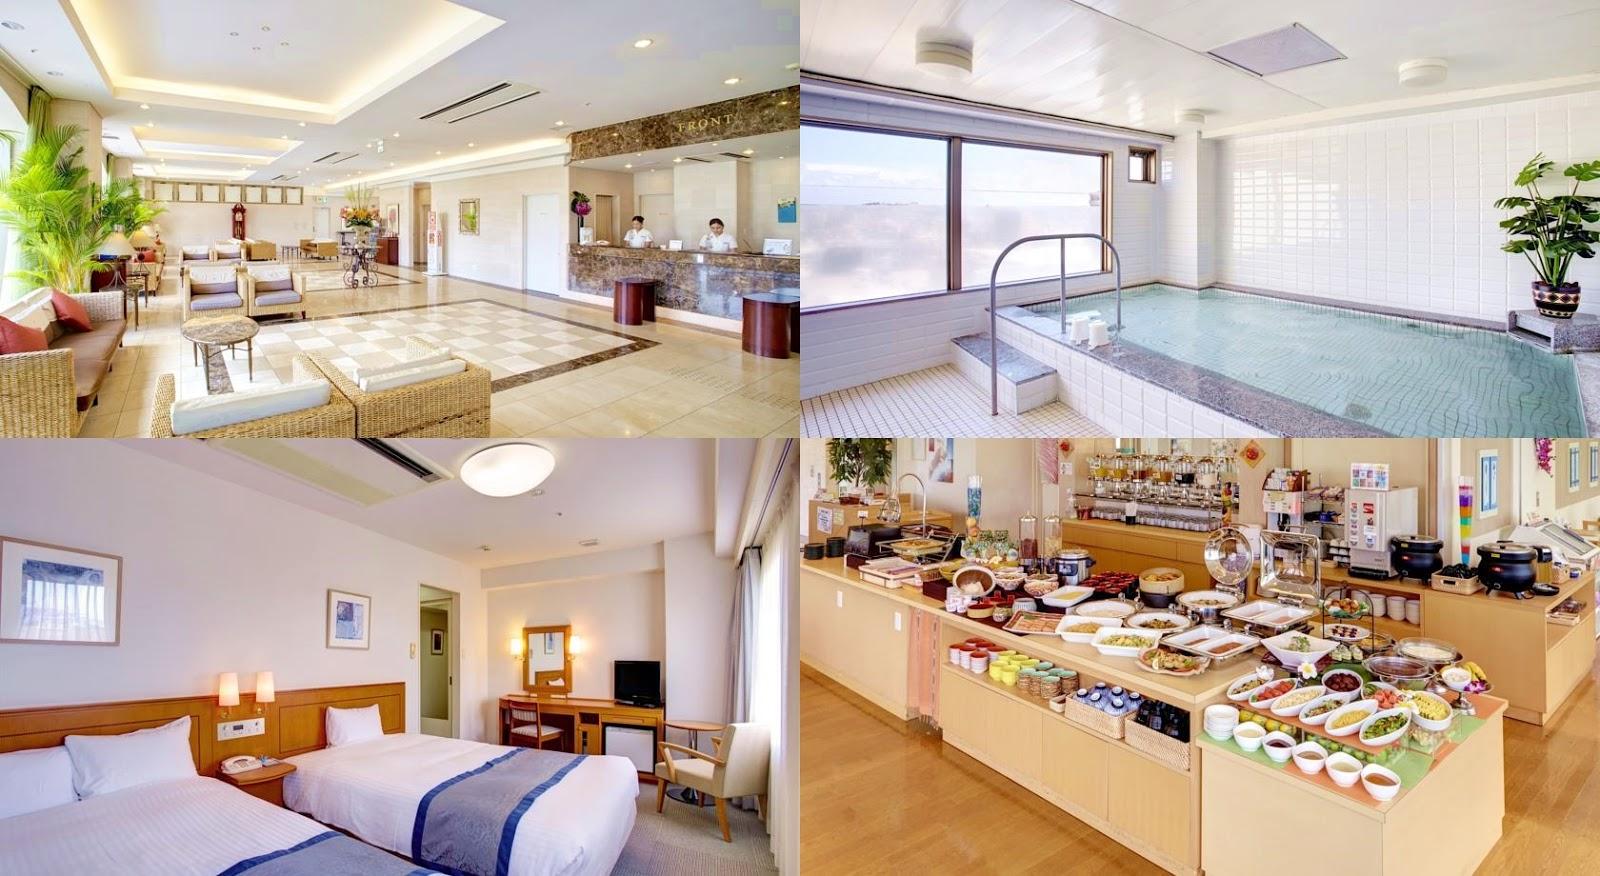 沖繩-住宿-推薦-那霸-新都心-法華俱樂部酒店-Hotel-Hokke-Club-Naha-Shintoshin-Okinawa-hotel-recommendation